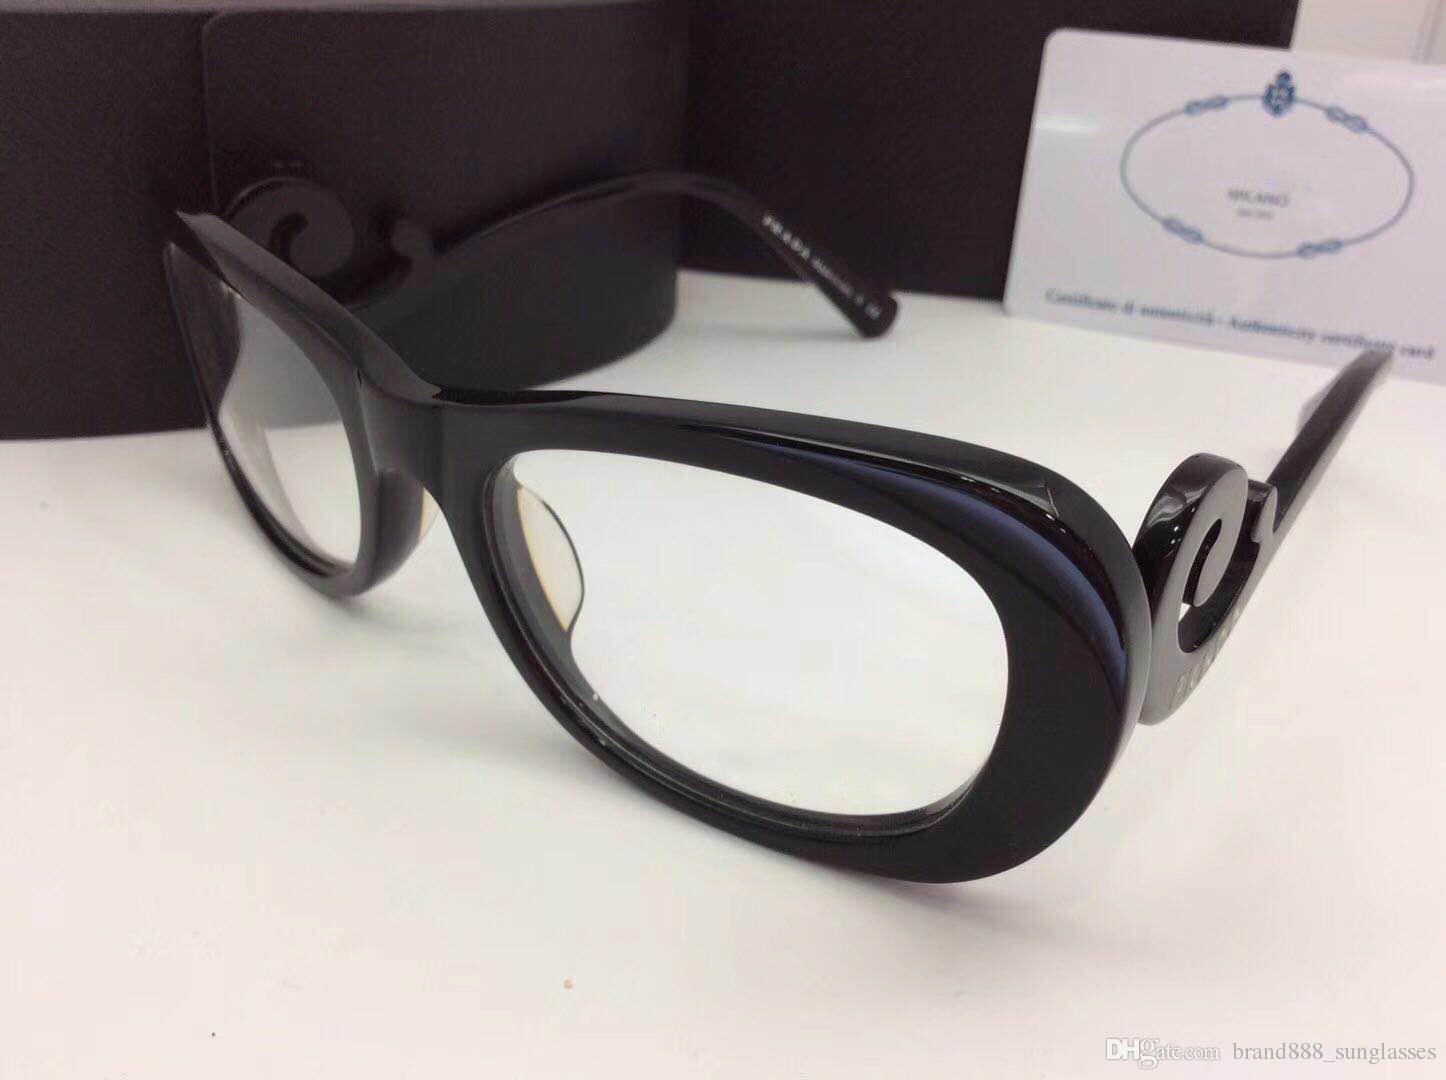 07fb375d1f5 New Fashion Brand Desinger Optical Eyeglasses SPR09P-A Model Black ...